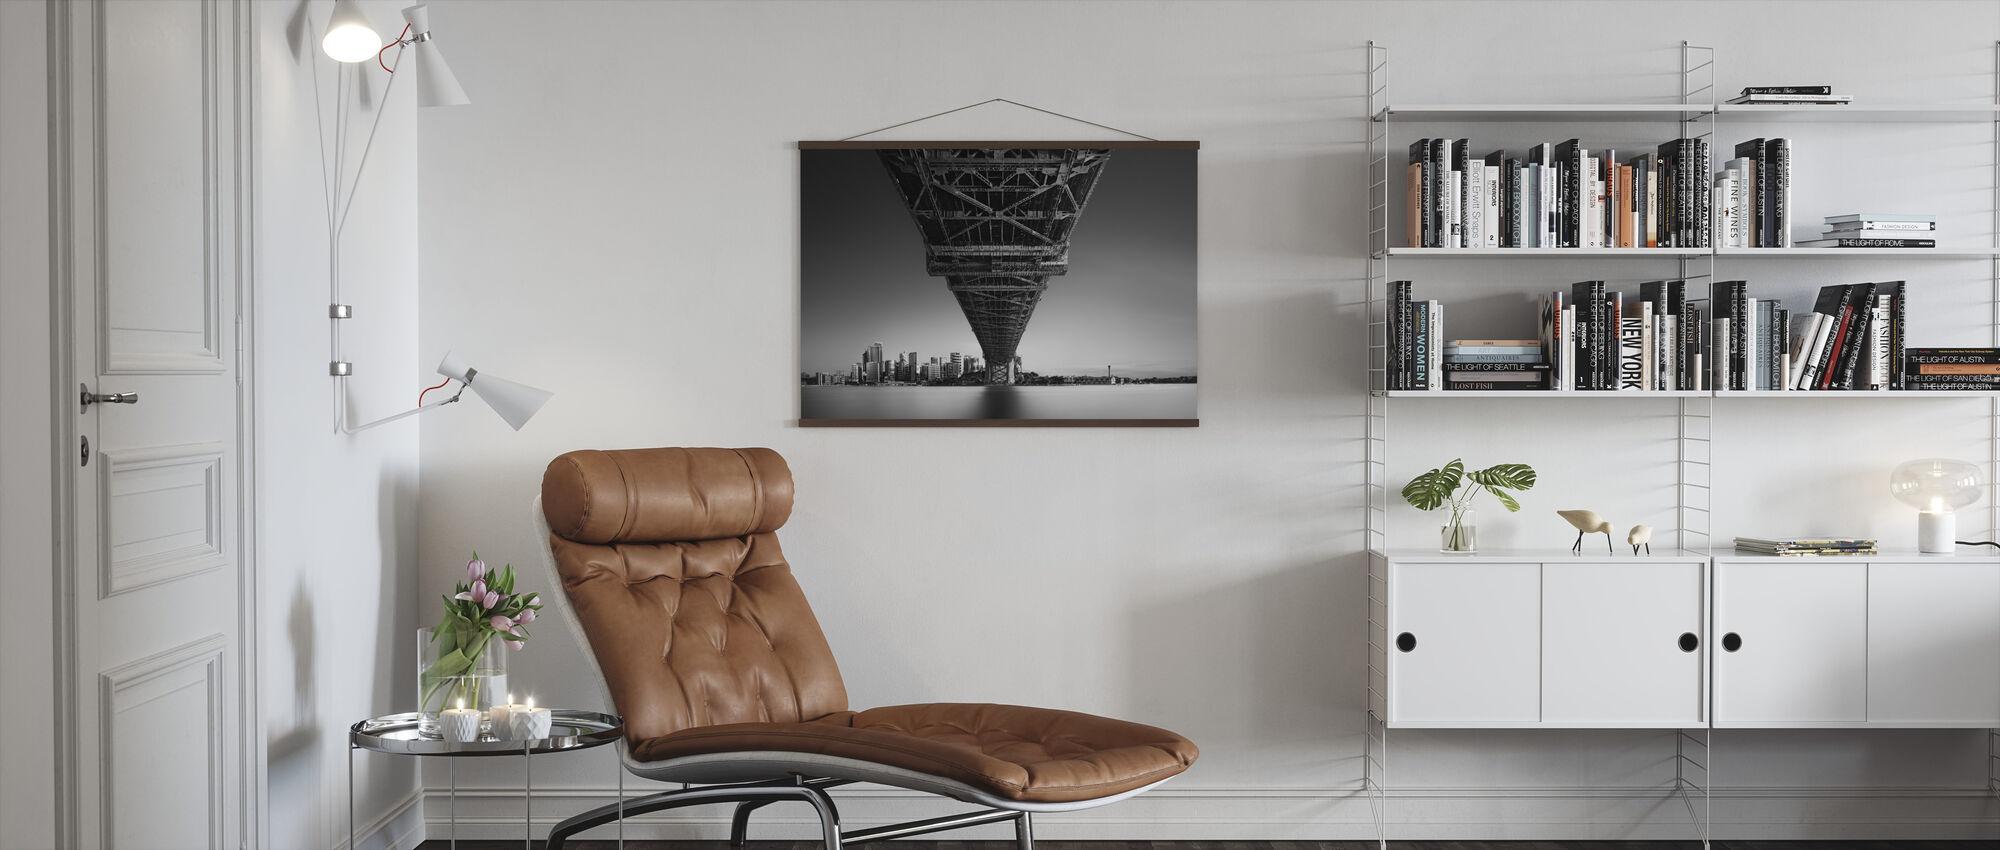 Back to Human Life - Poster - Living Room